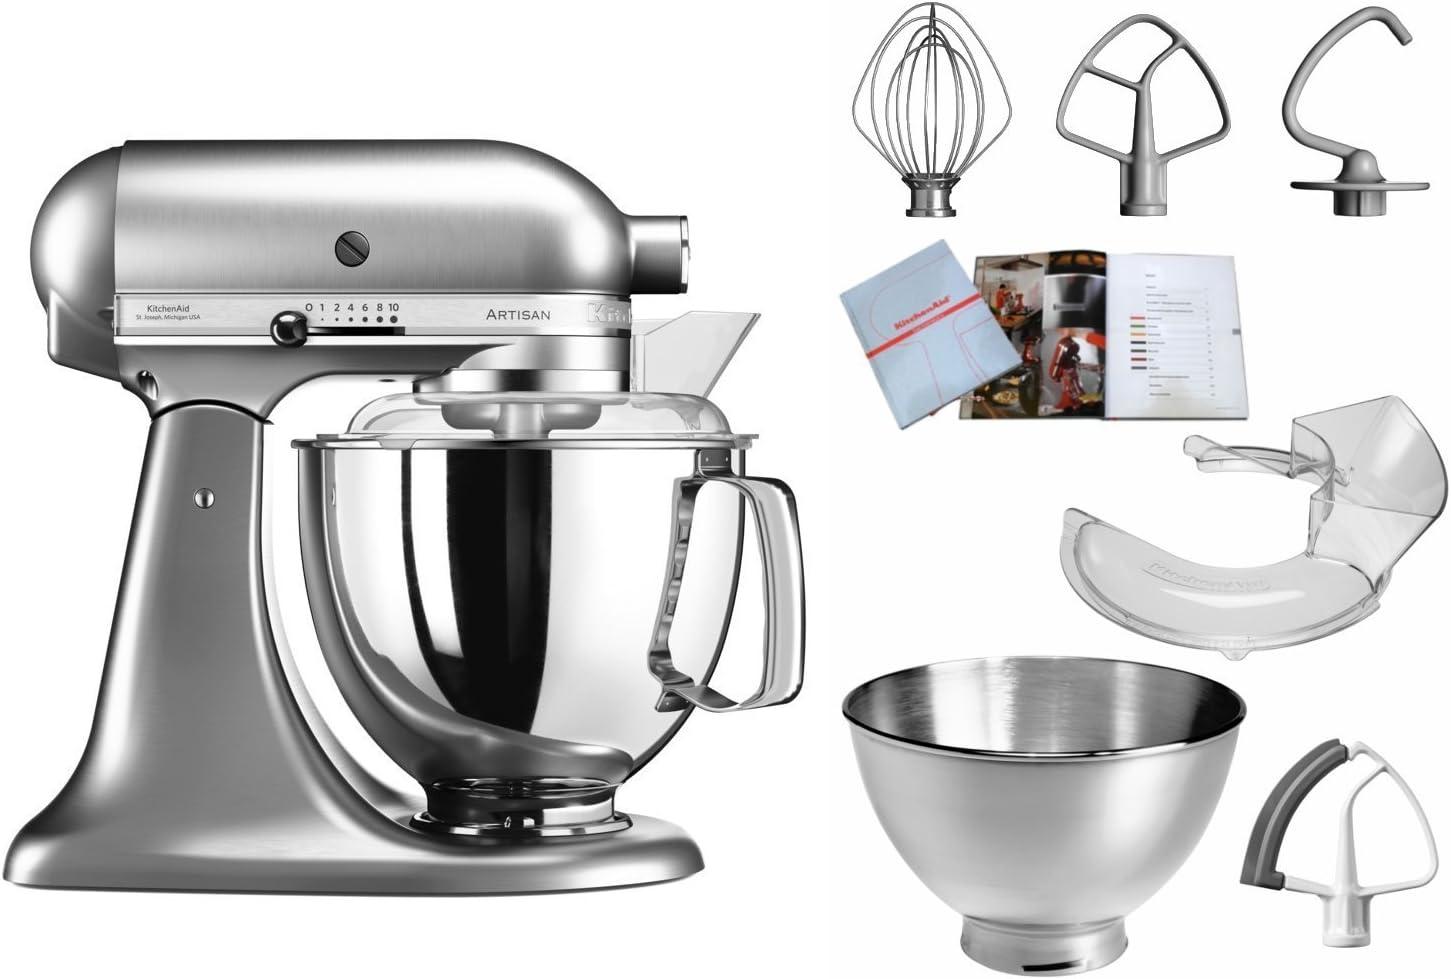 KitchenAid Artisan - Robot de cocina (4,8 L, Níquel, palanca, 220 RPM, 1,454 m, AC): Amazon.es: Hogar